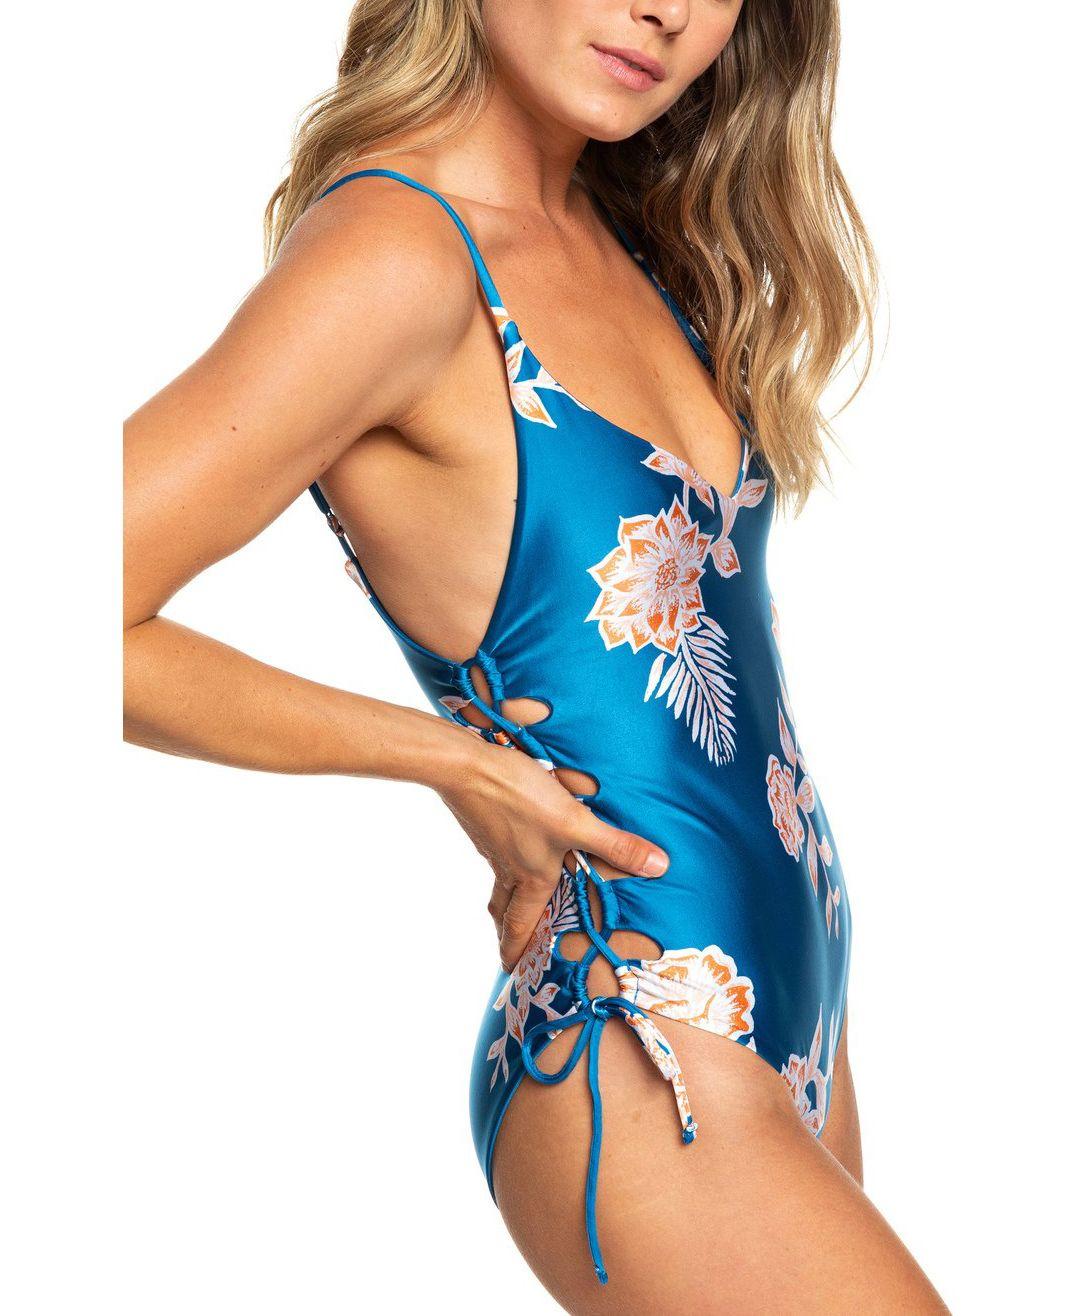 4a04e3d1df95e Roxy Women's Riding Moon One Piece Swimsuit. noImageFound. Previous. 1. 2. 3